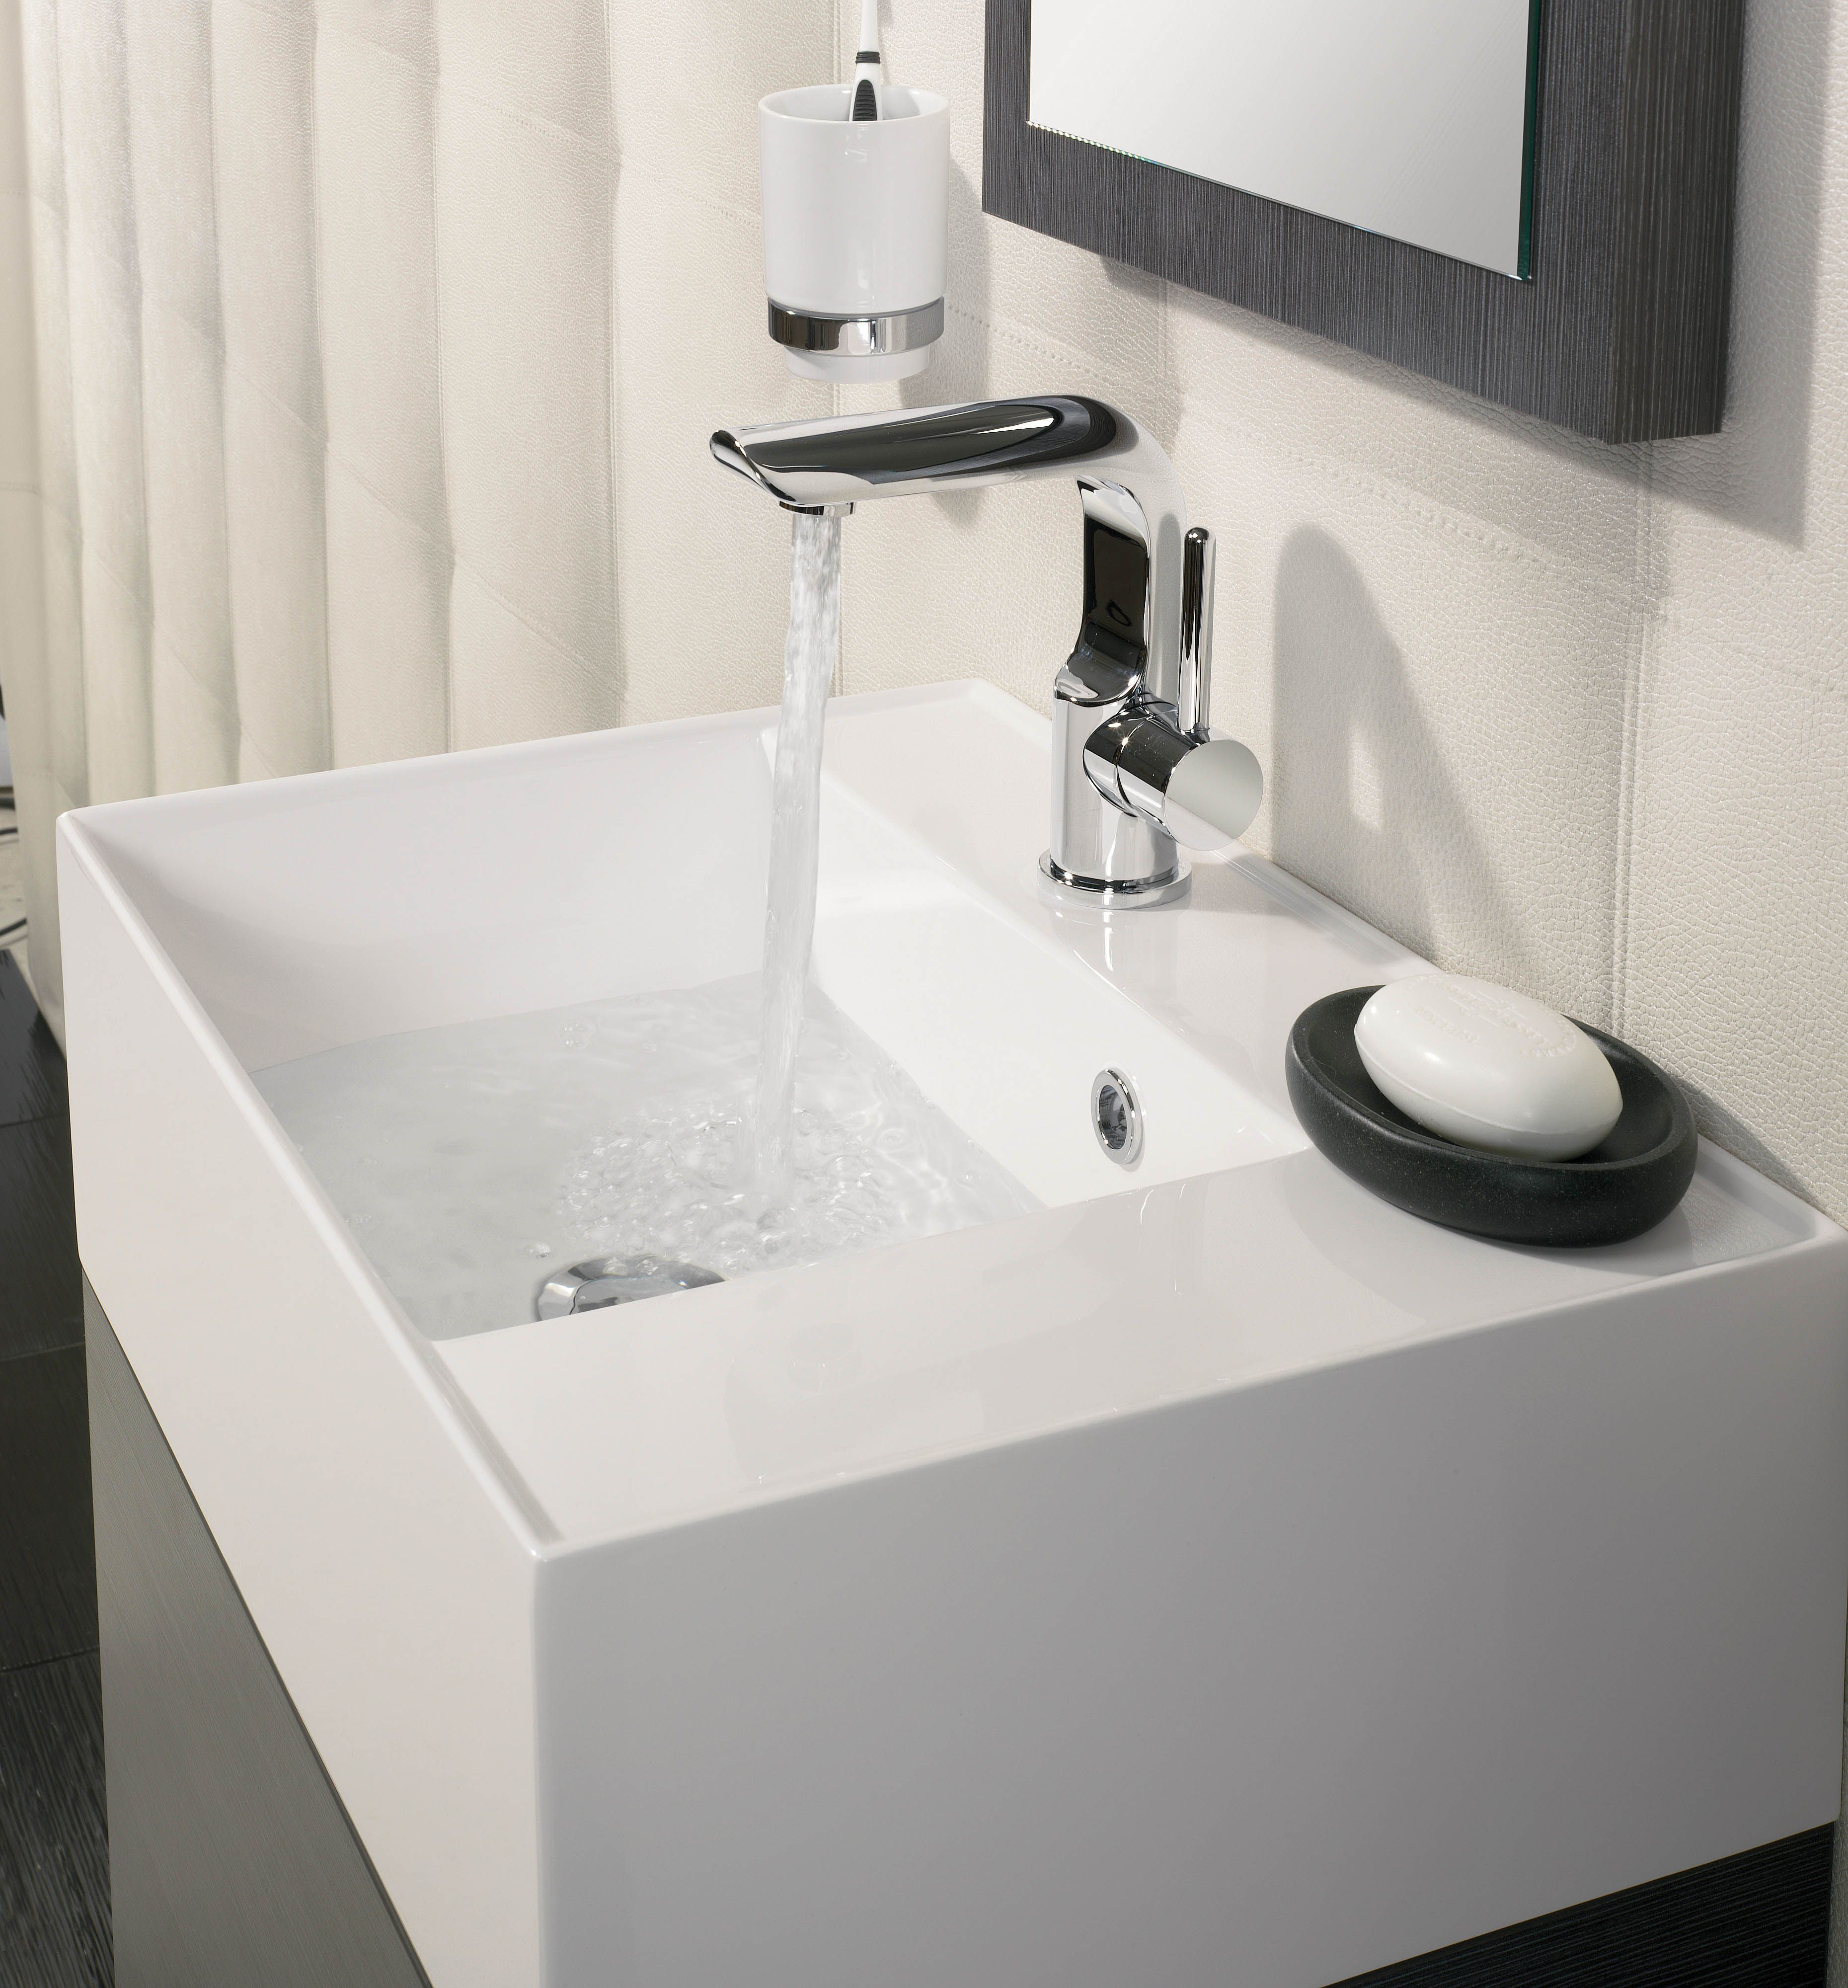 Elite Steel Bathroom Furniture Unit & Basin from